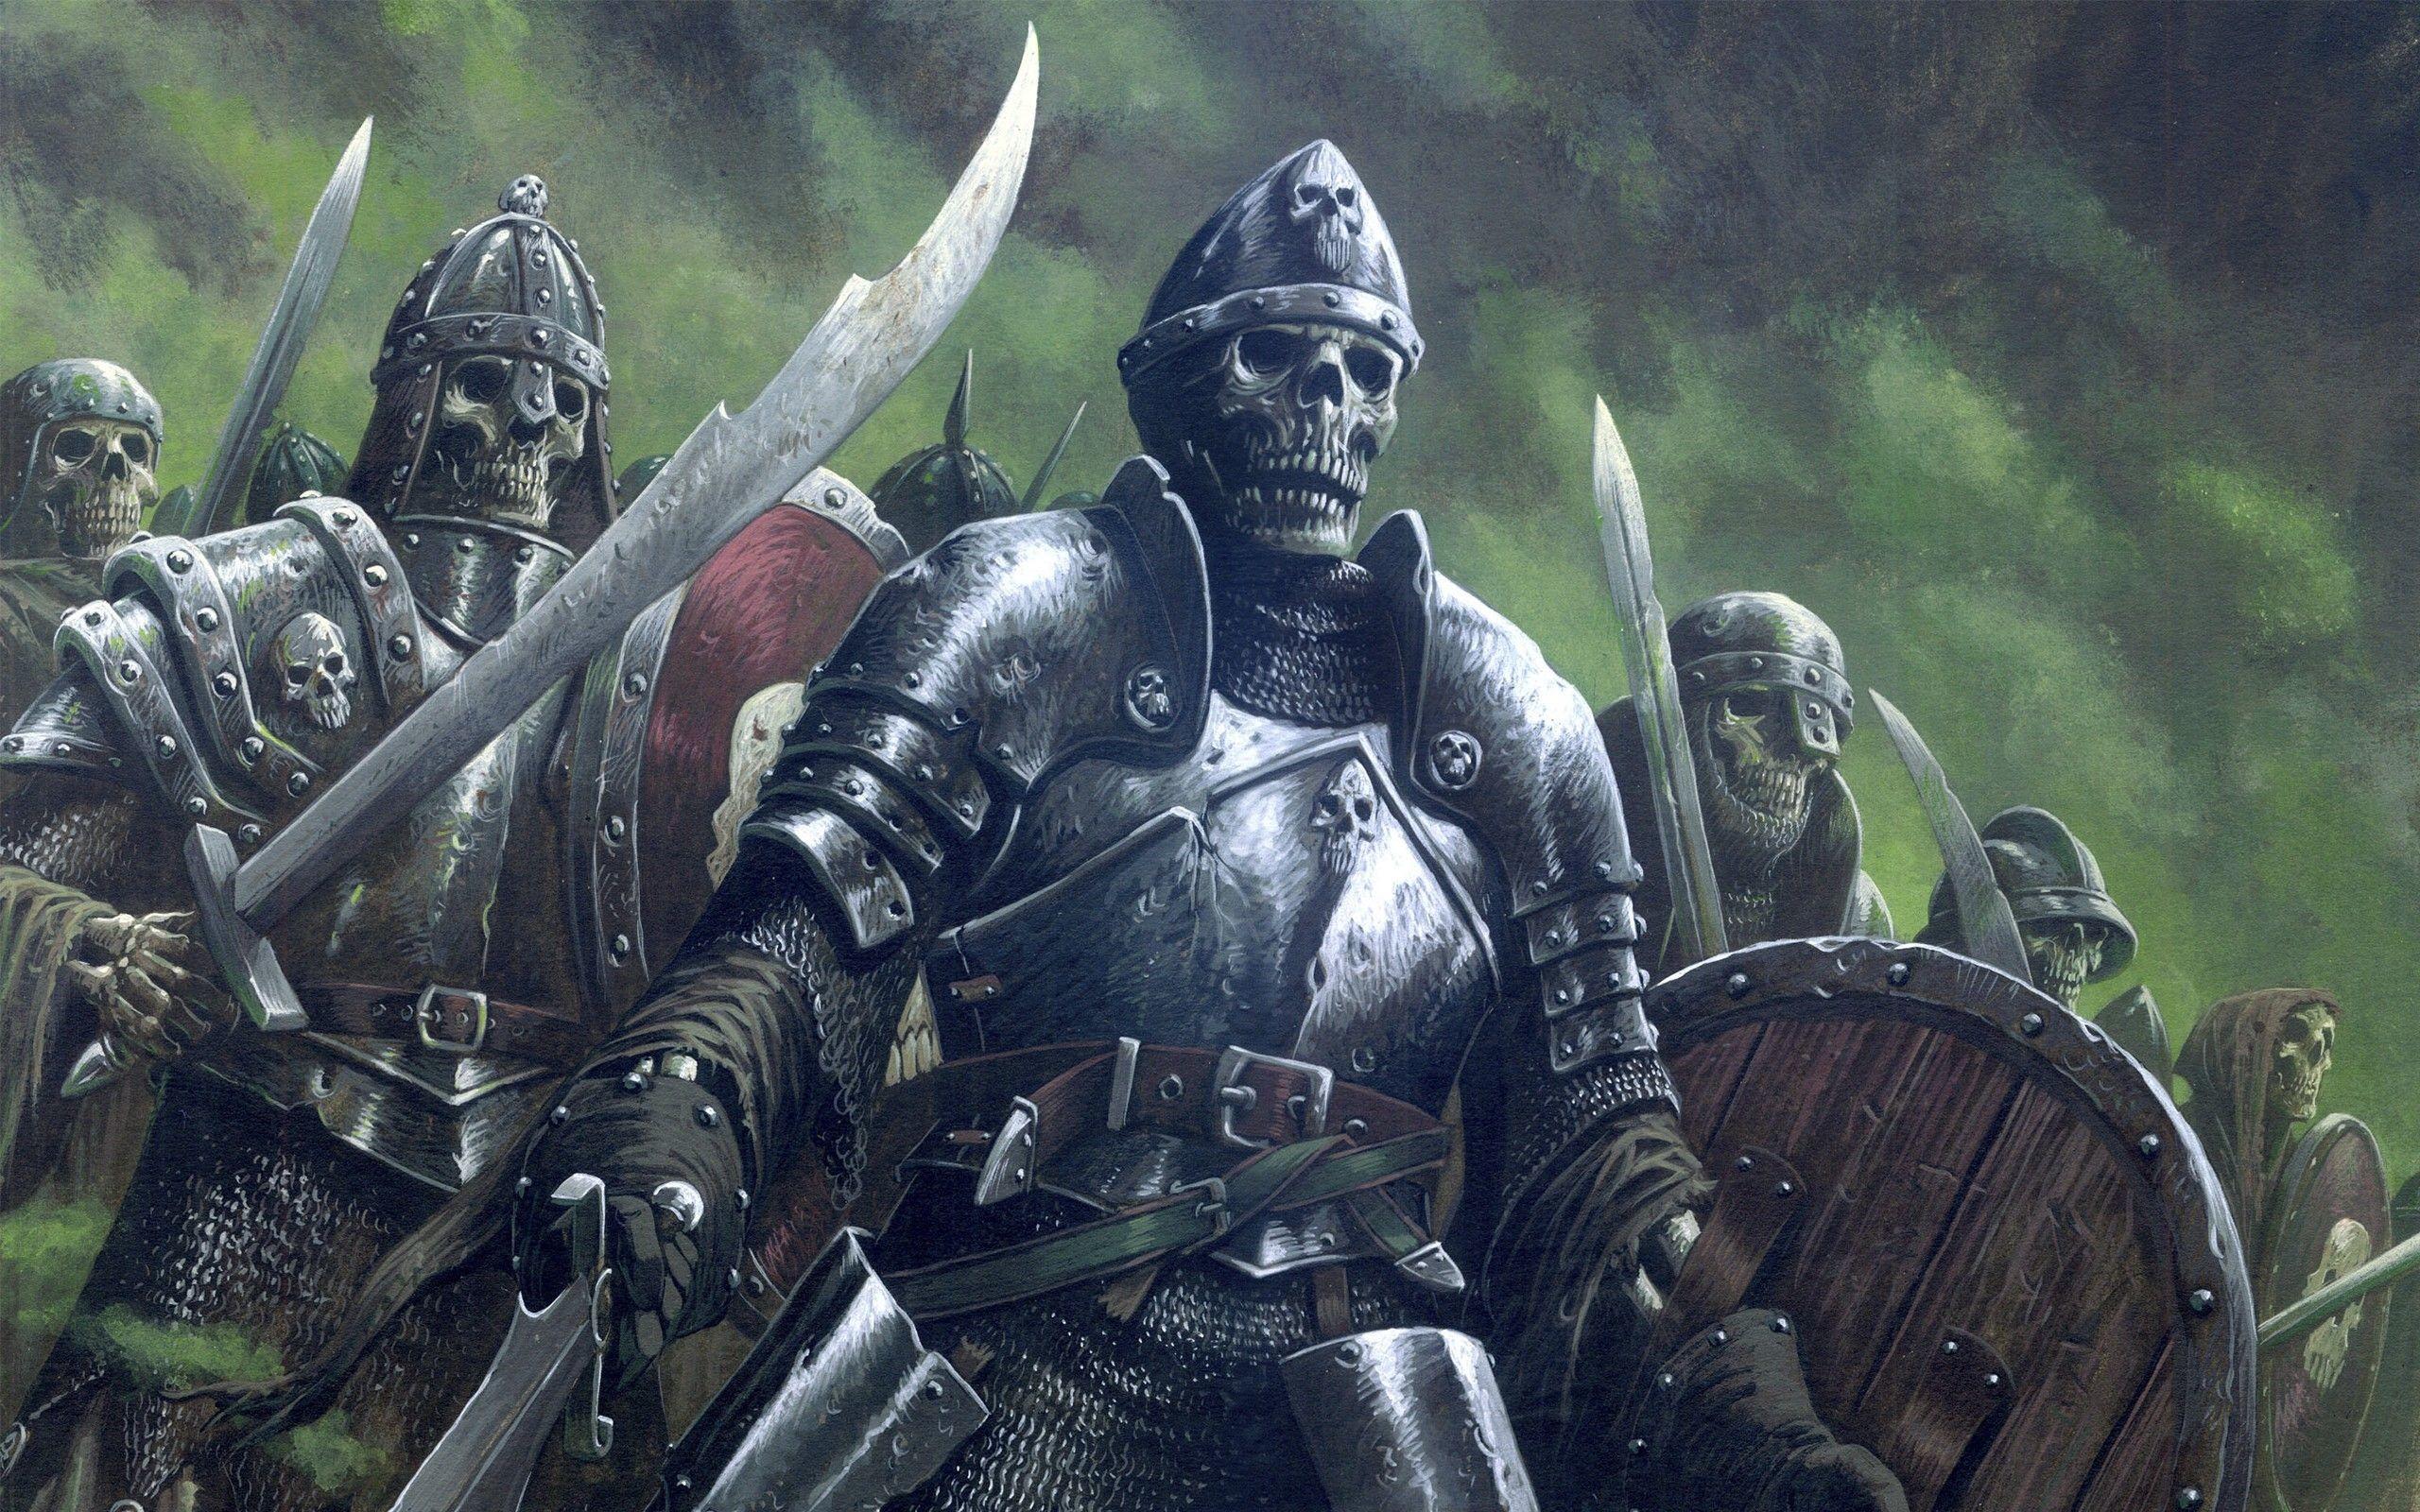 Res: 2560x1600, Army undead fantasy art armor skeletons artwork warriors wallpaper .